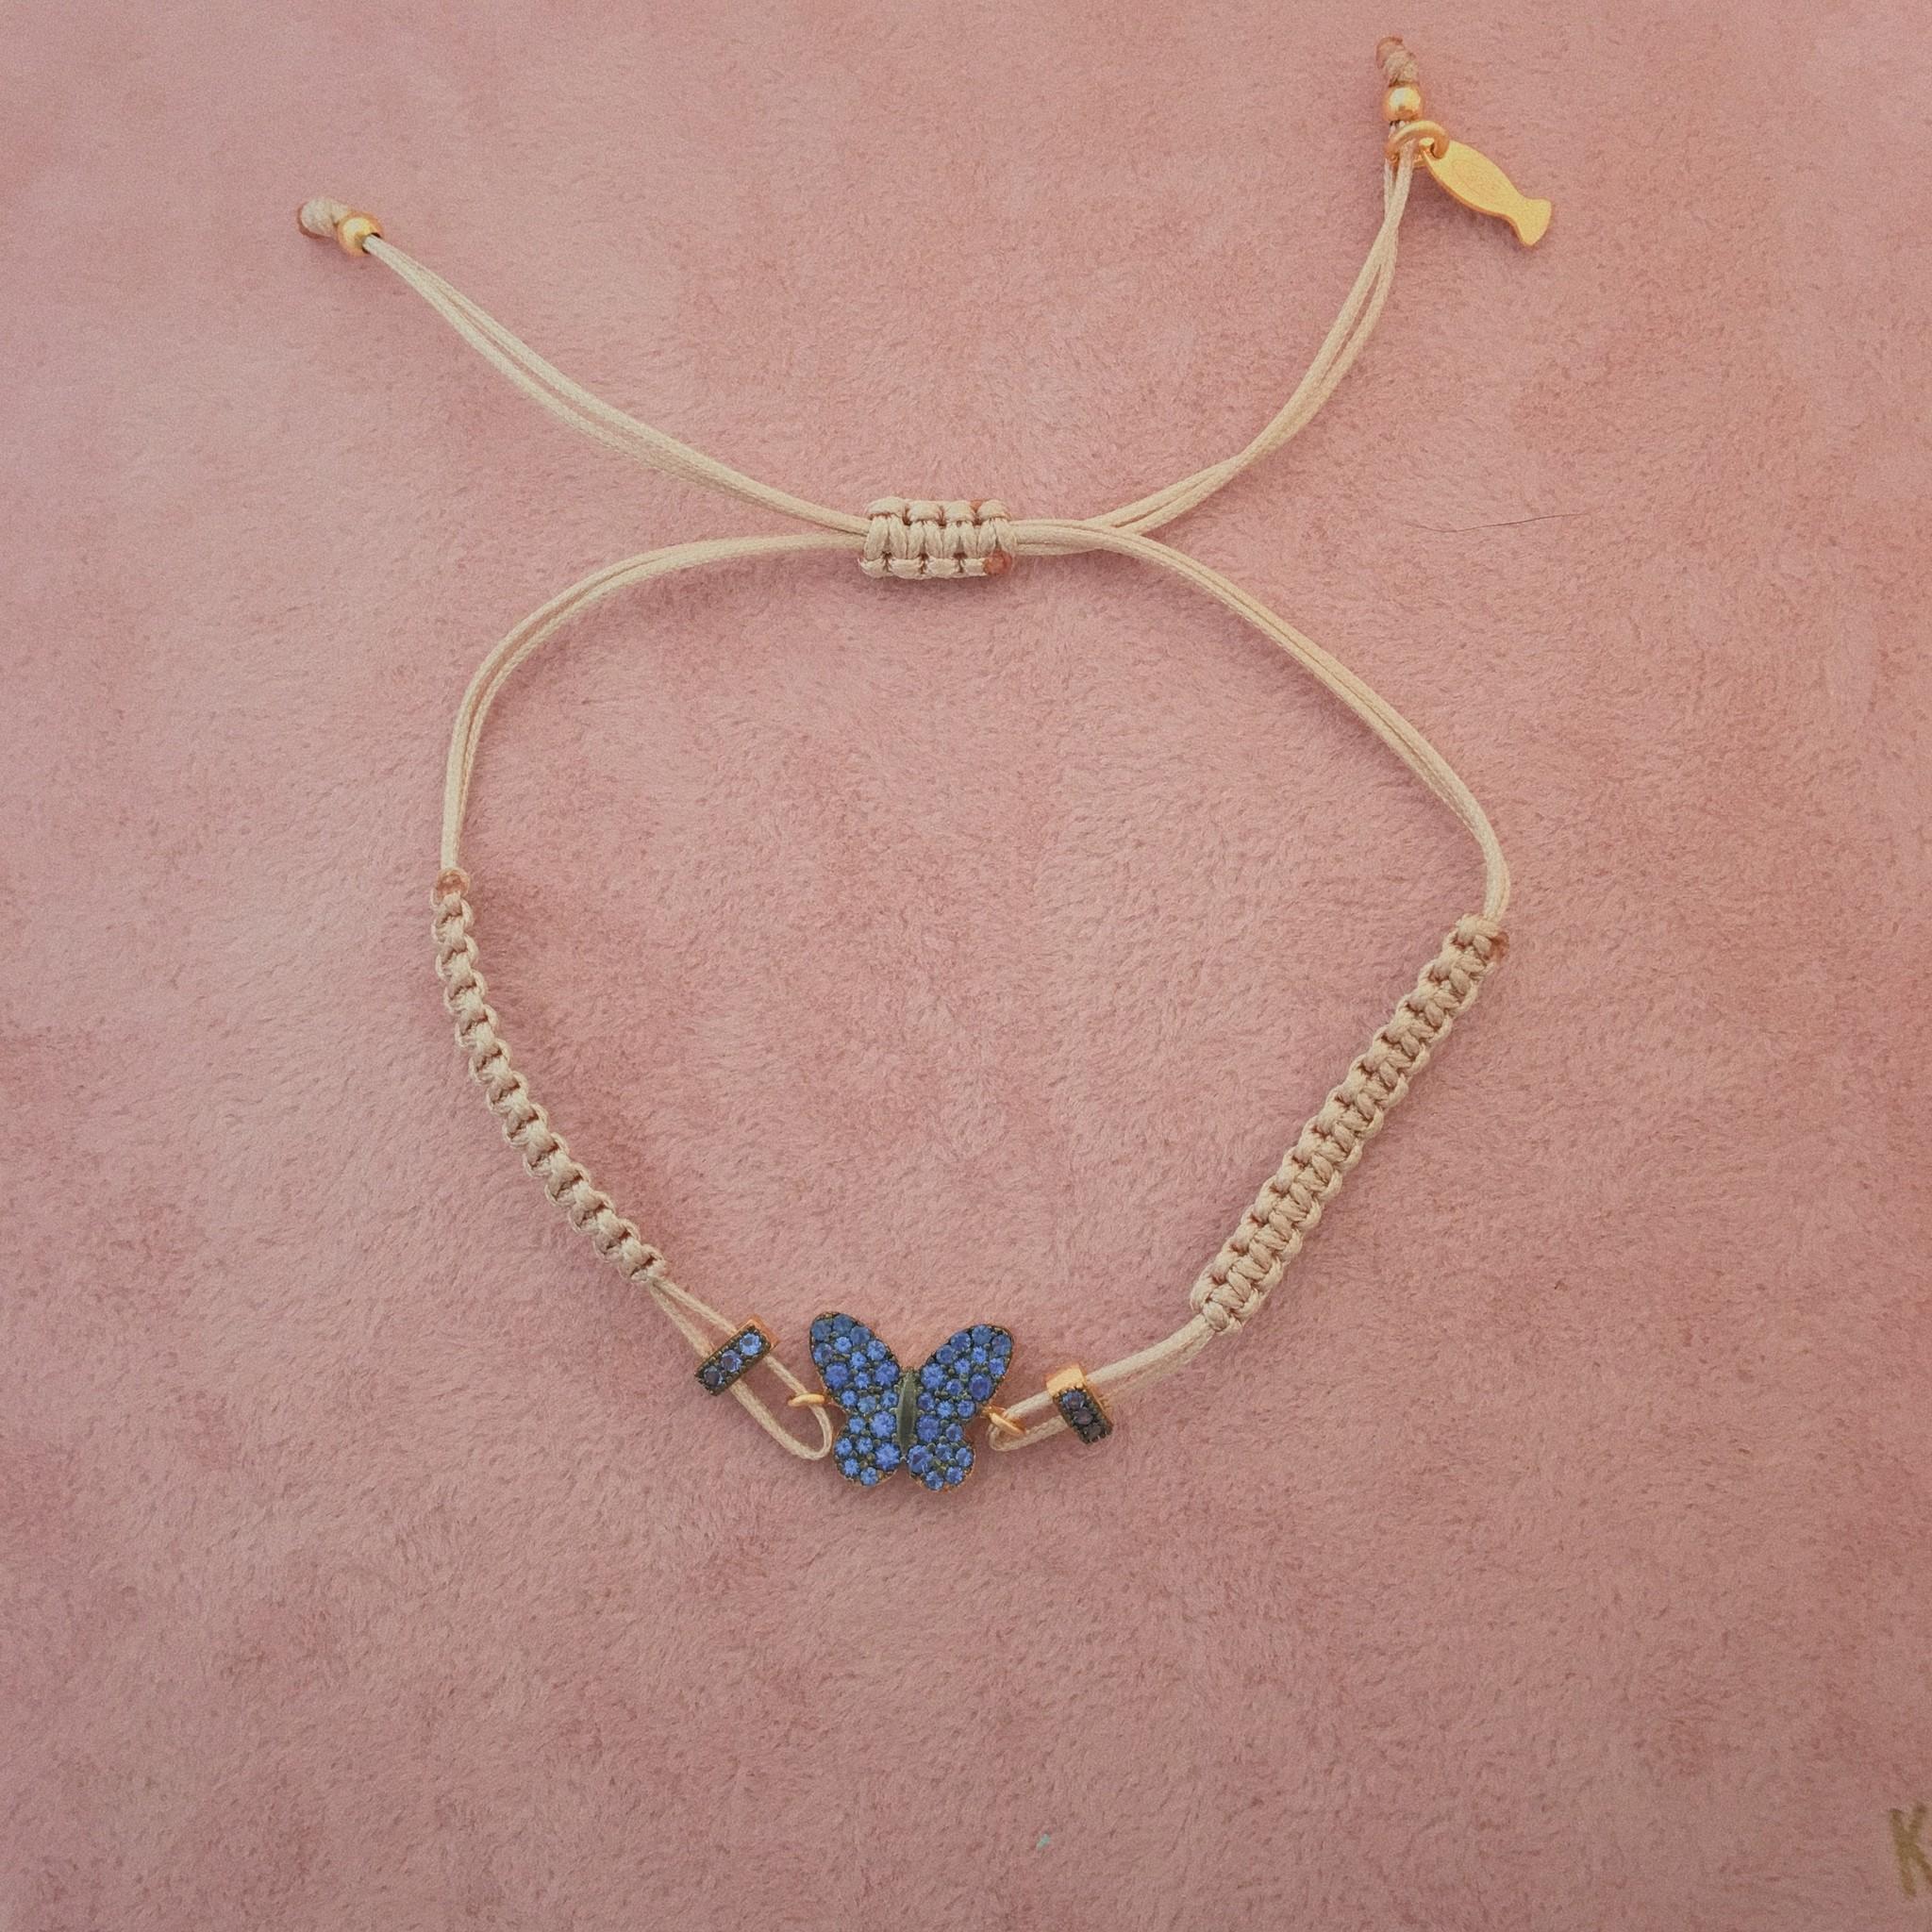 Kurshuni Jewellery Blue Pave Butterly Pull Cord Nude